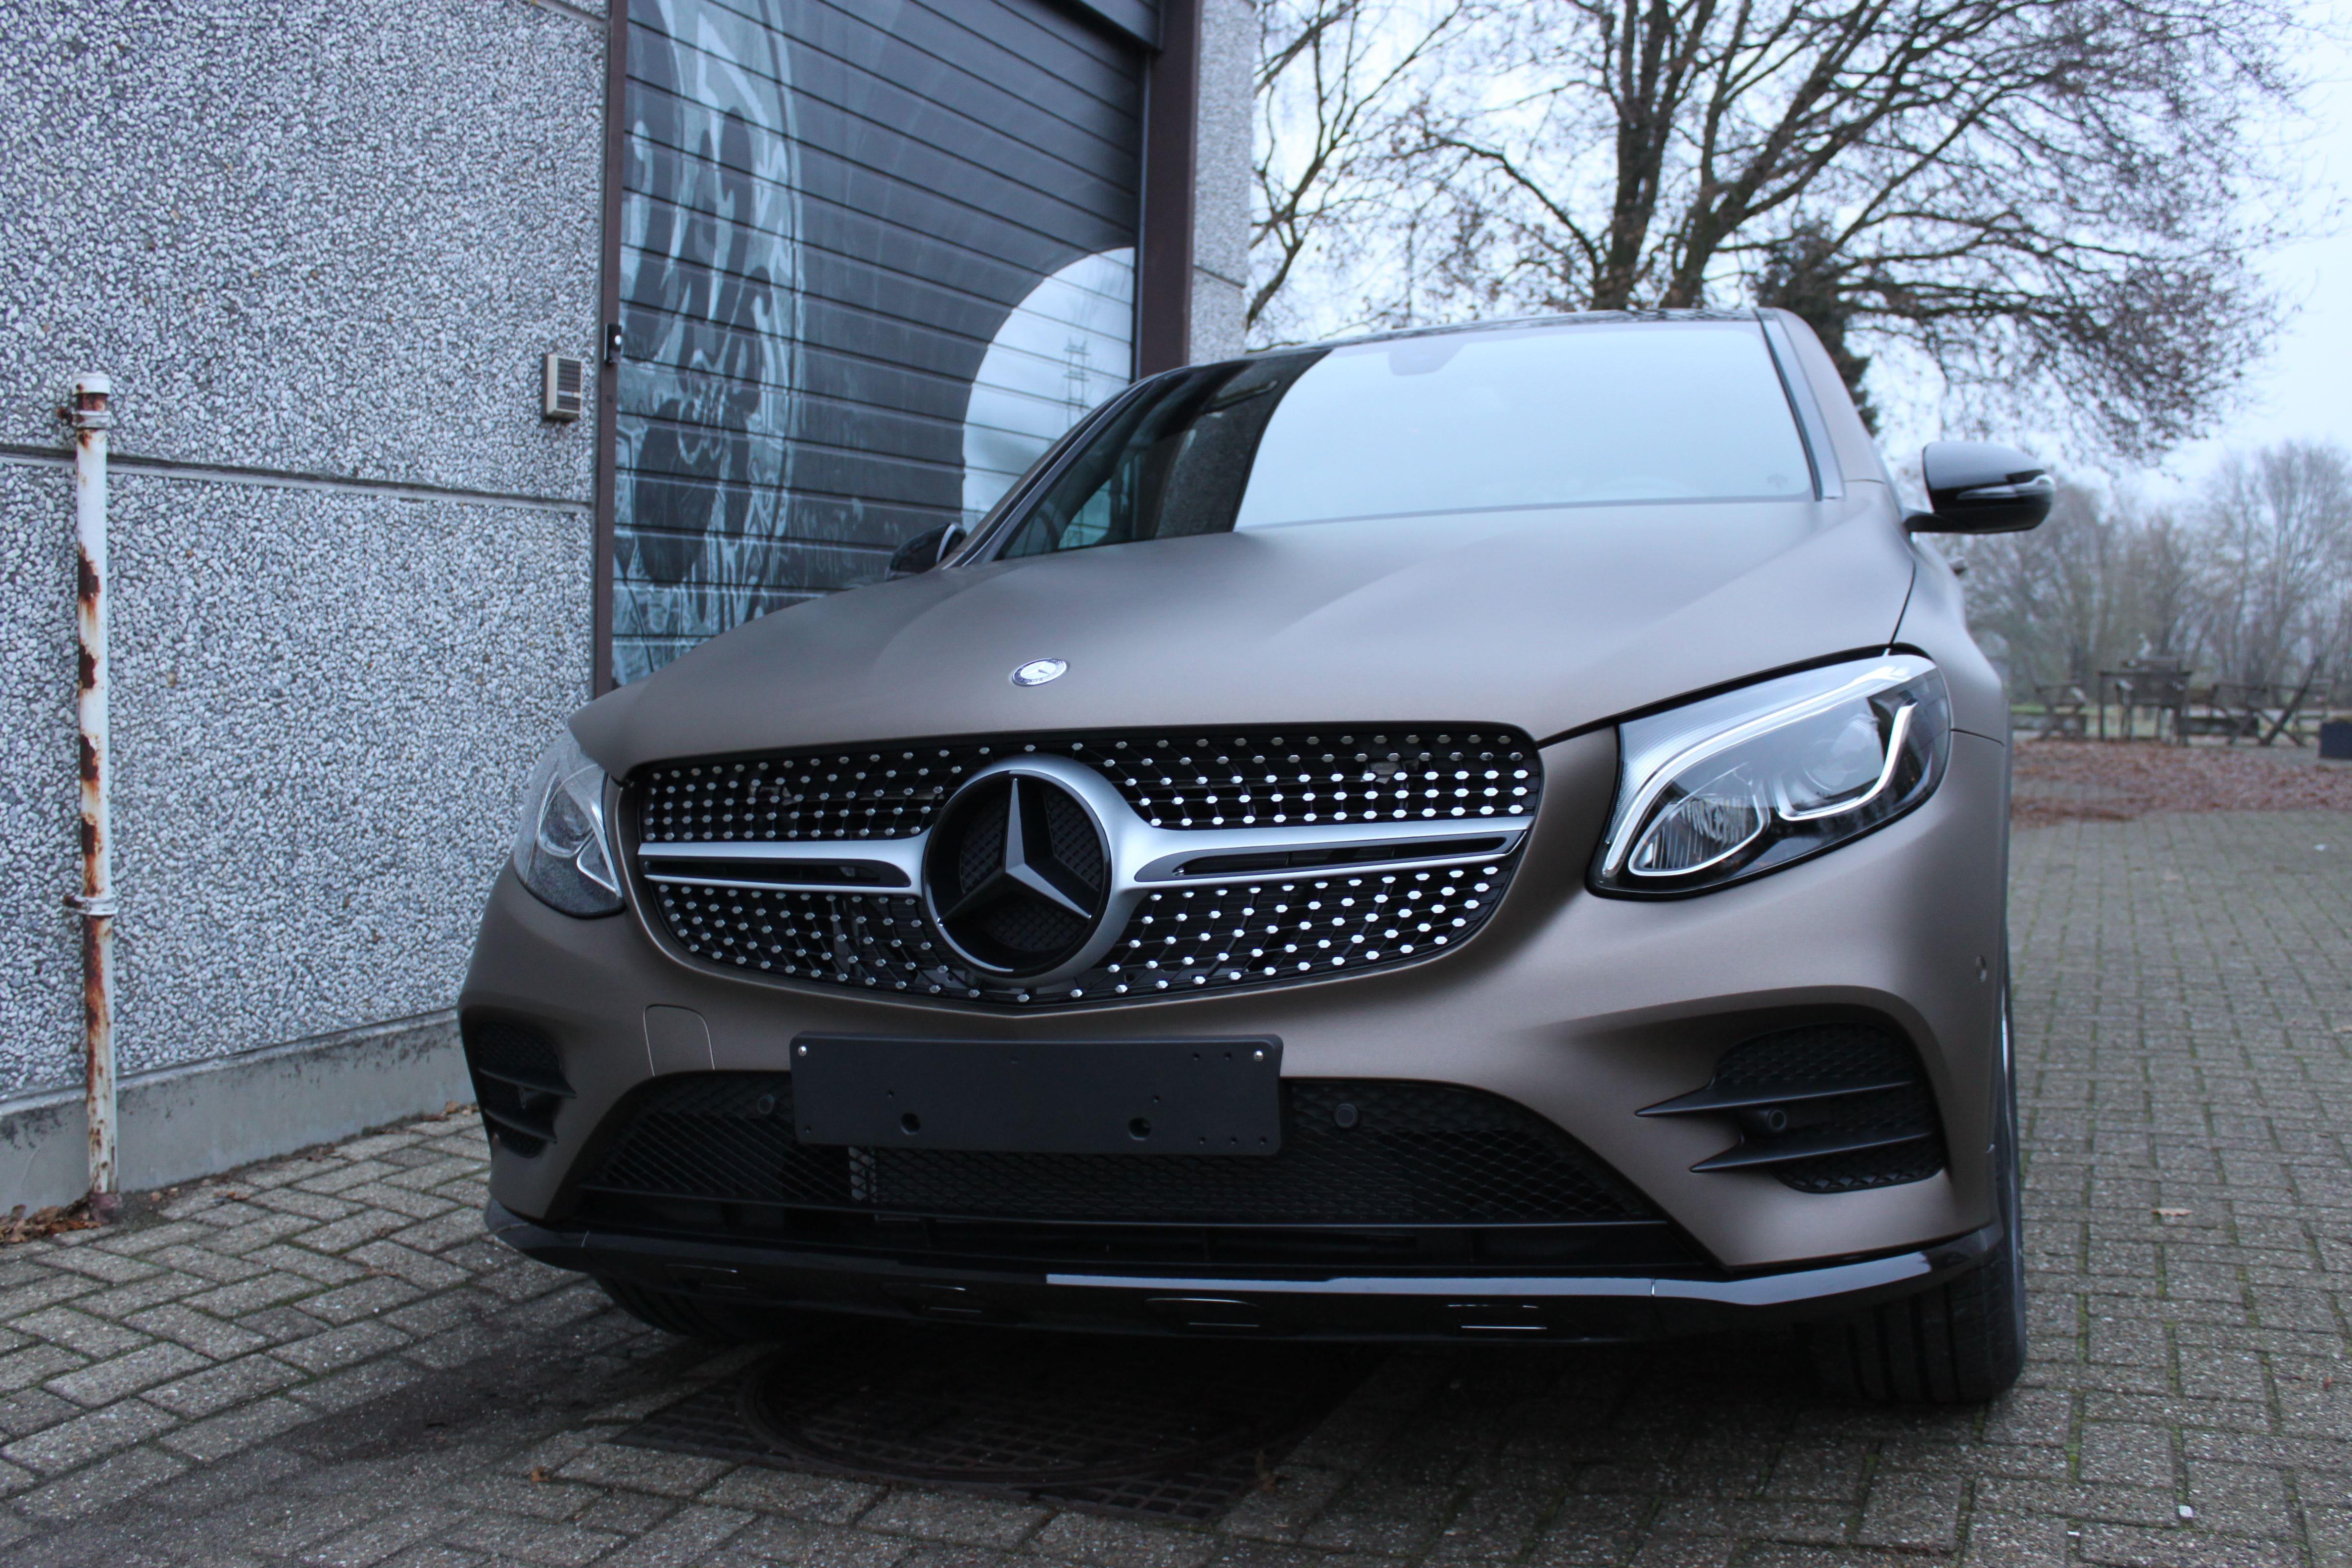 Mercedes GLC Coupe Matte metallic brown, Carwrapping door Wrapmyride.nu Foto-nr:9358, ©2021